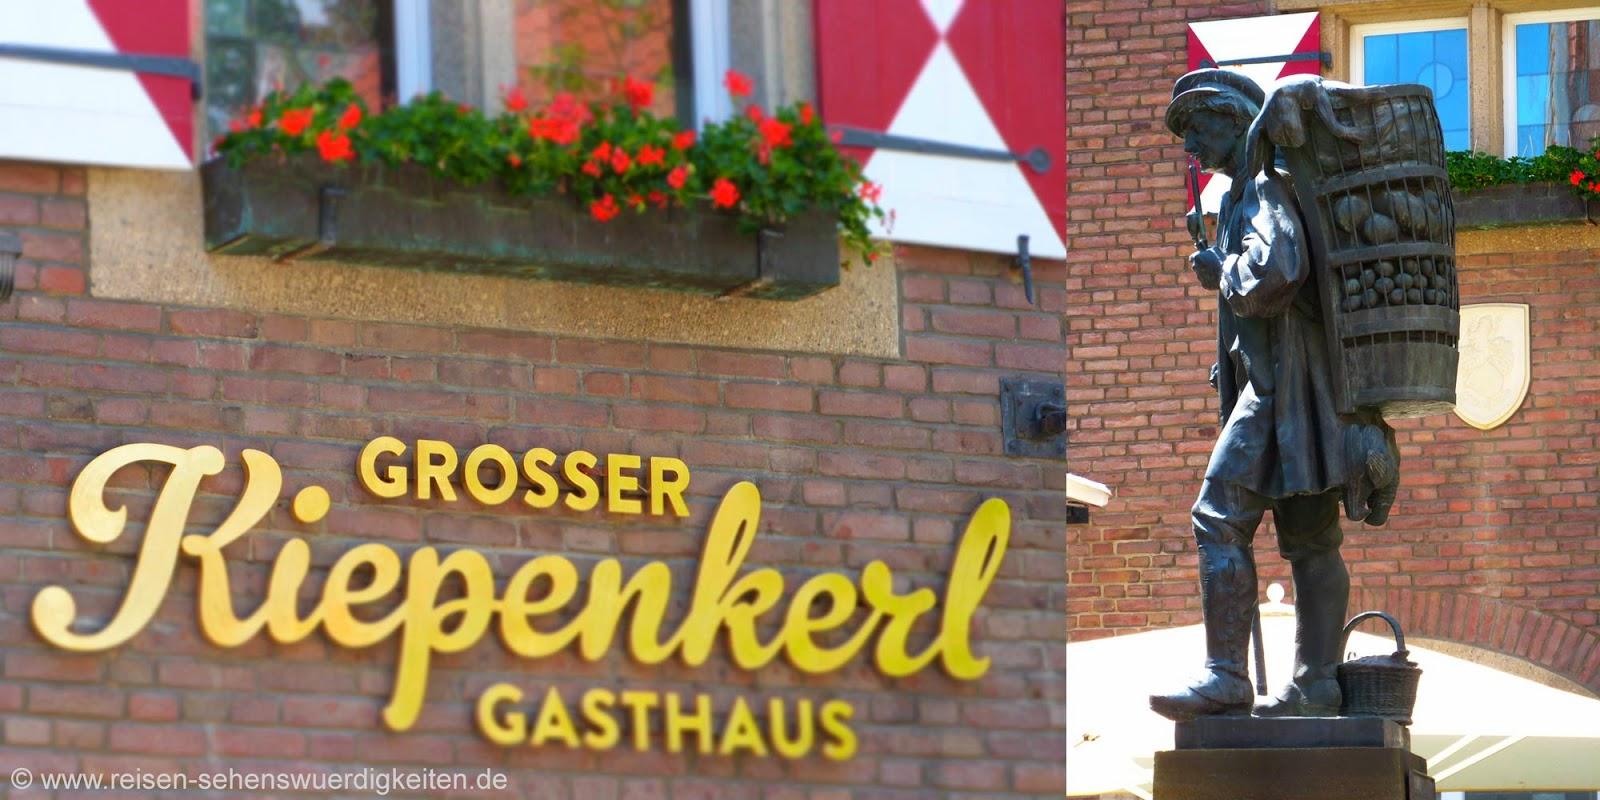 Gasthaus Grosser Kiepenkerl in Münster, Statue Kiepenkerl